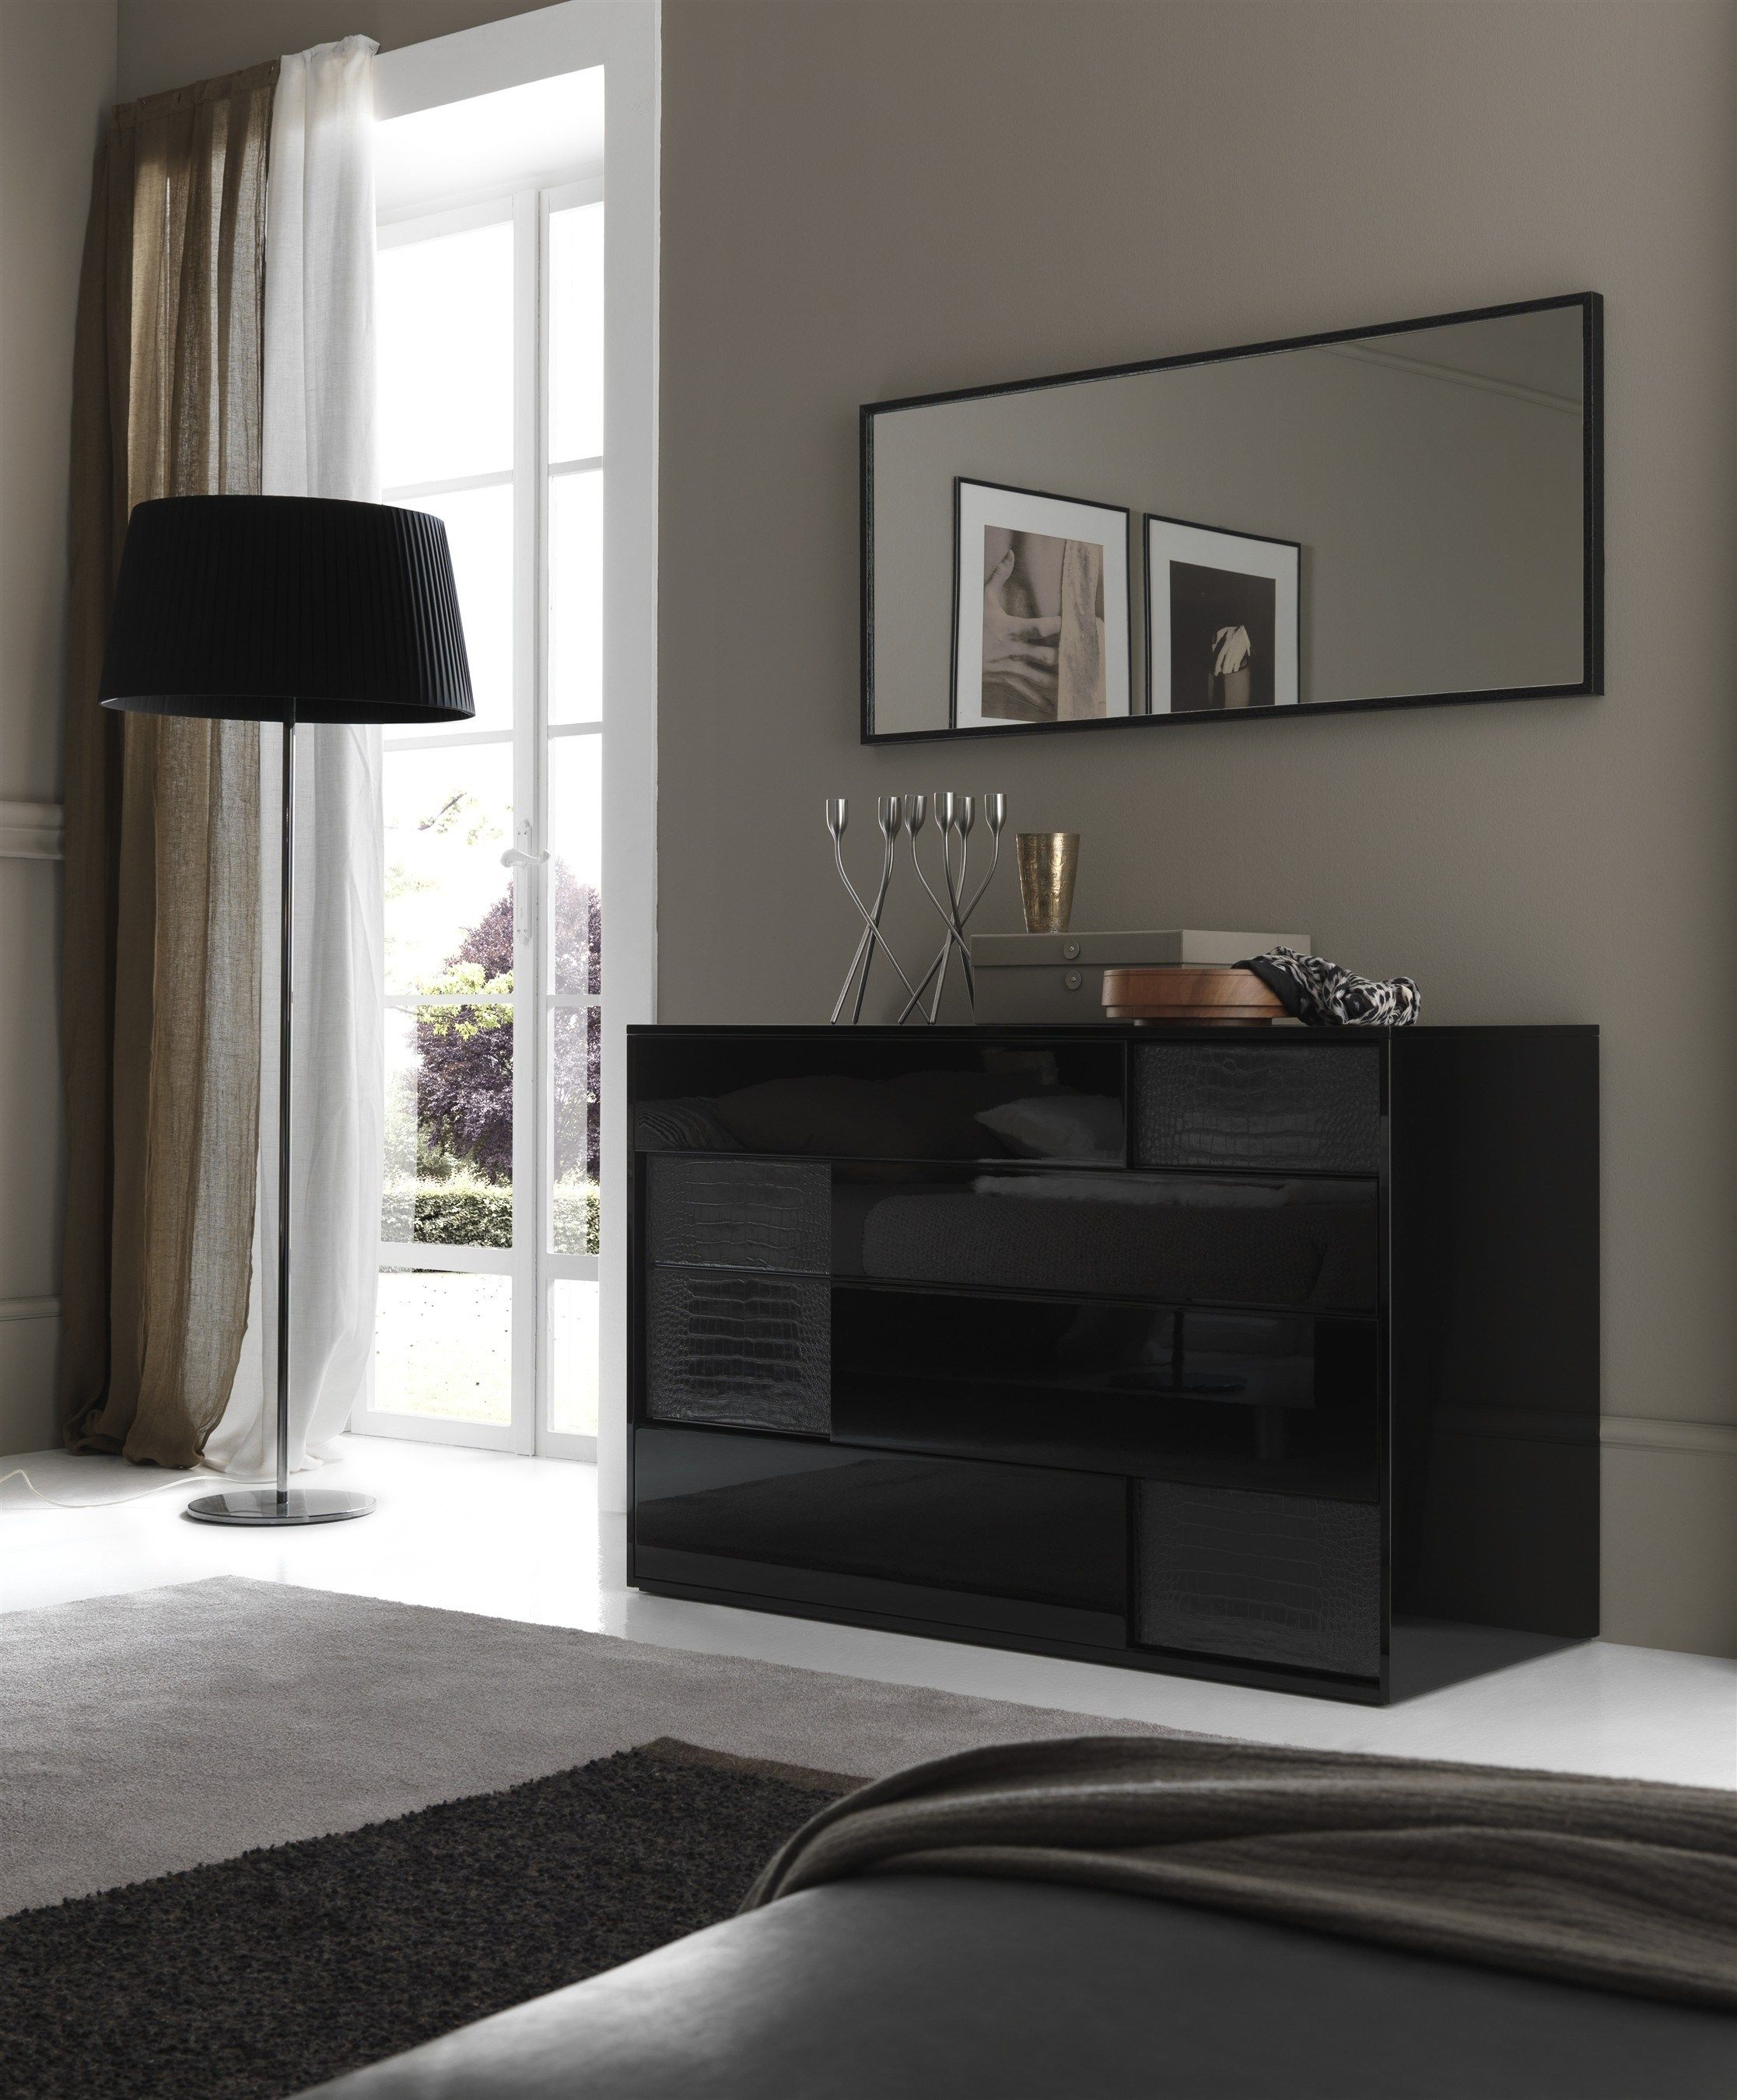 Living Room Furniture Black Gloss Hgtv Rooms Contemporary Modern High Bedroom Dresser